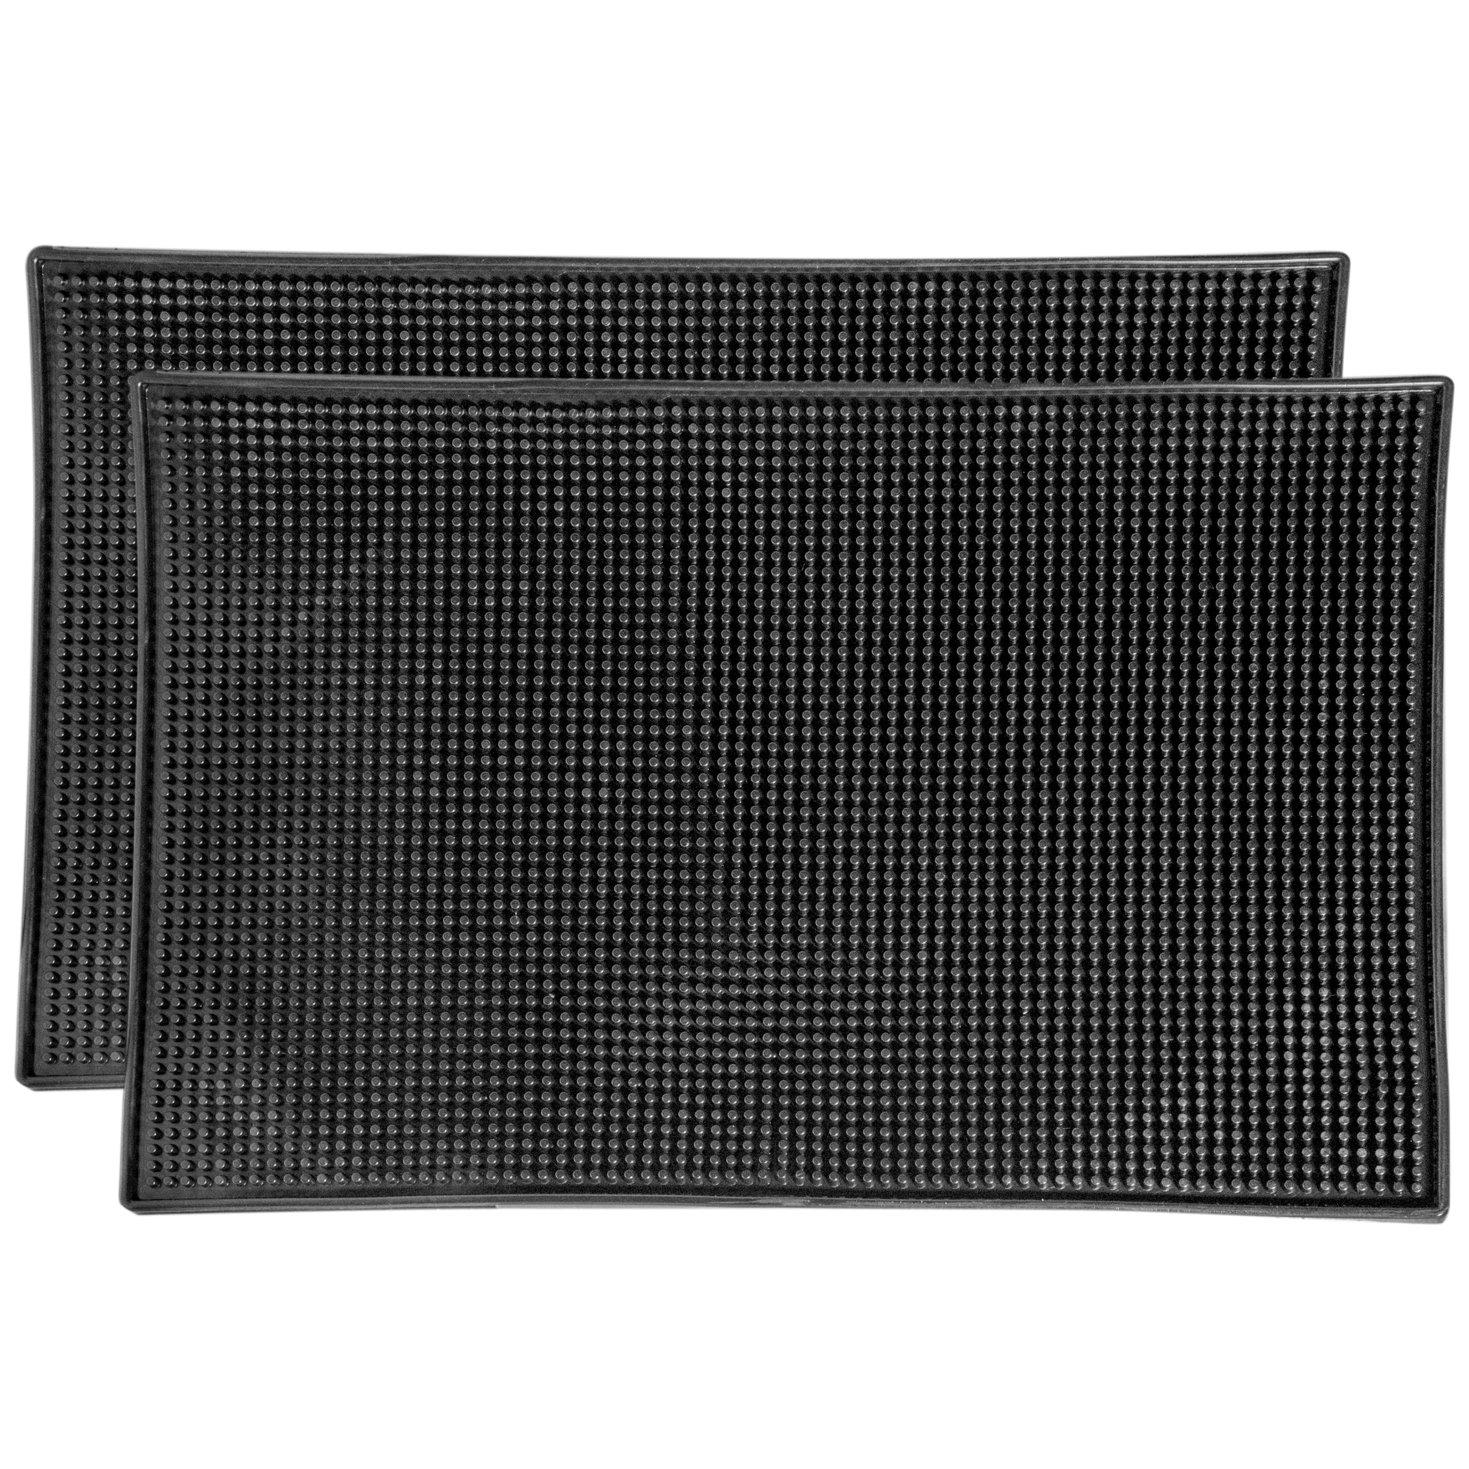 BonBon Professional 18'' x 12'' Rubber Bar Service Mat with Trim (2 Pack)